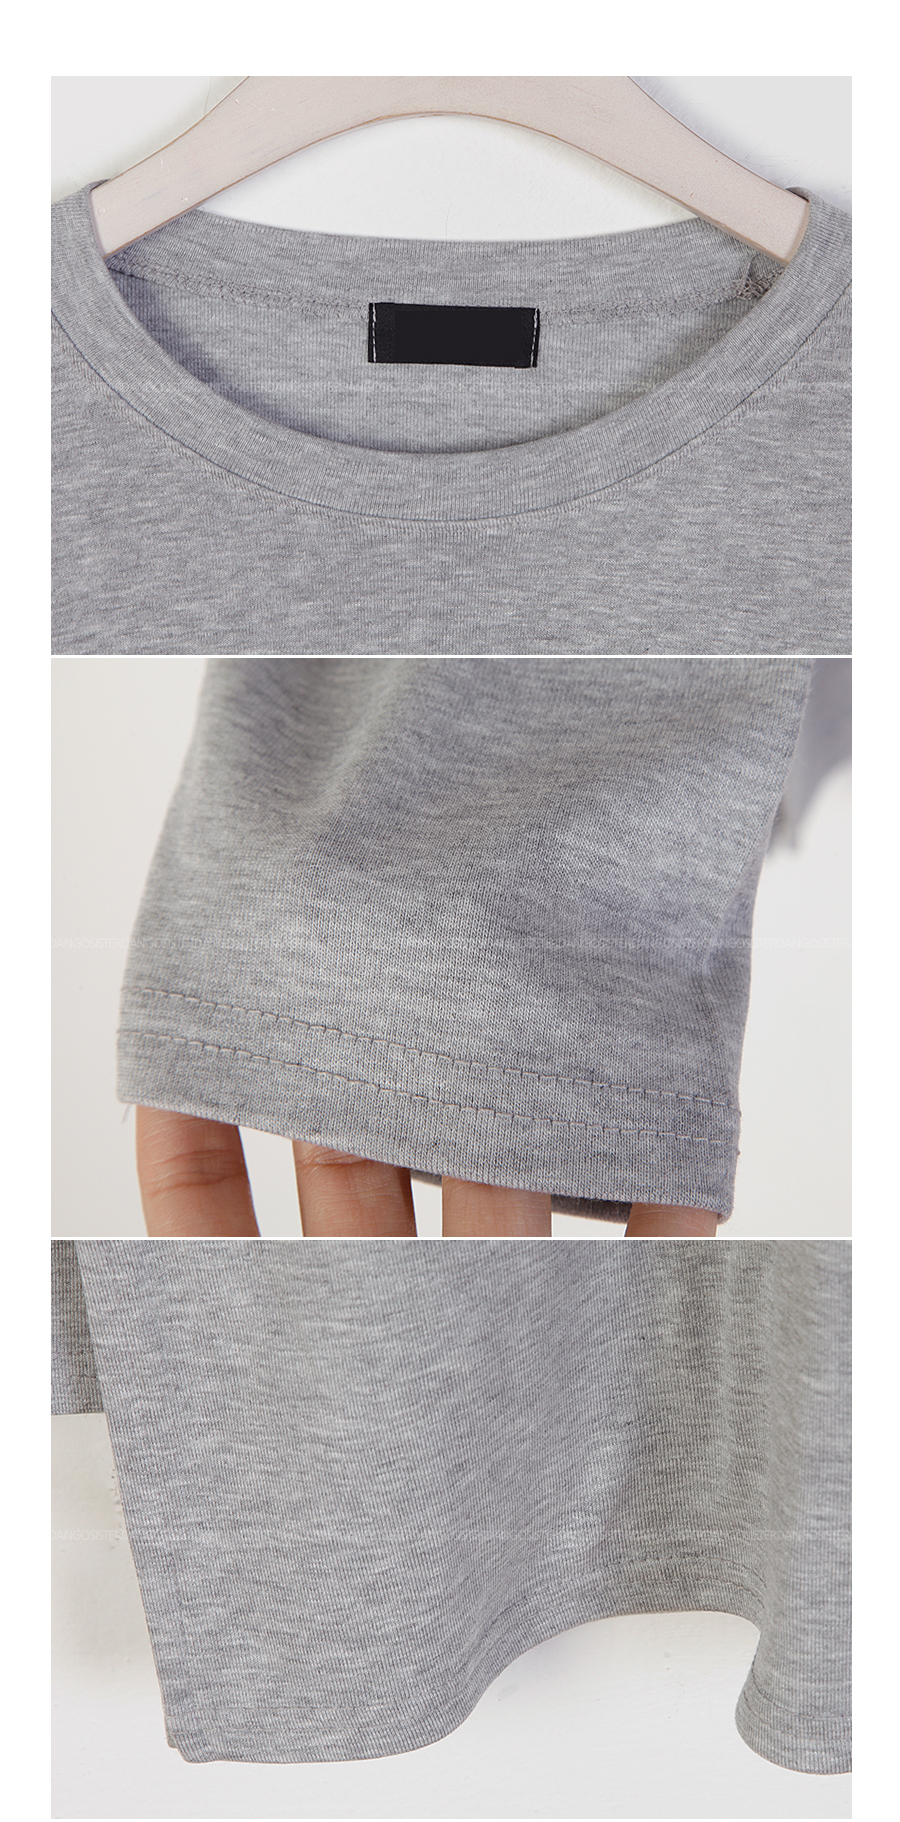 Hot Inner Long T ♥ in the Fleece-lined